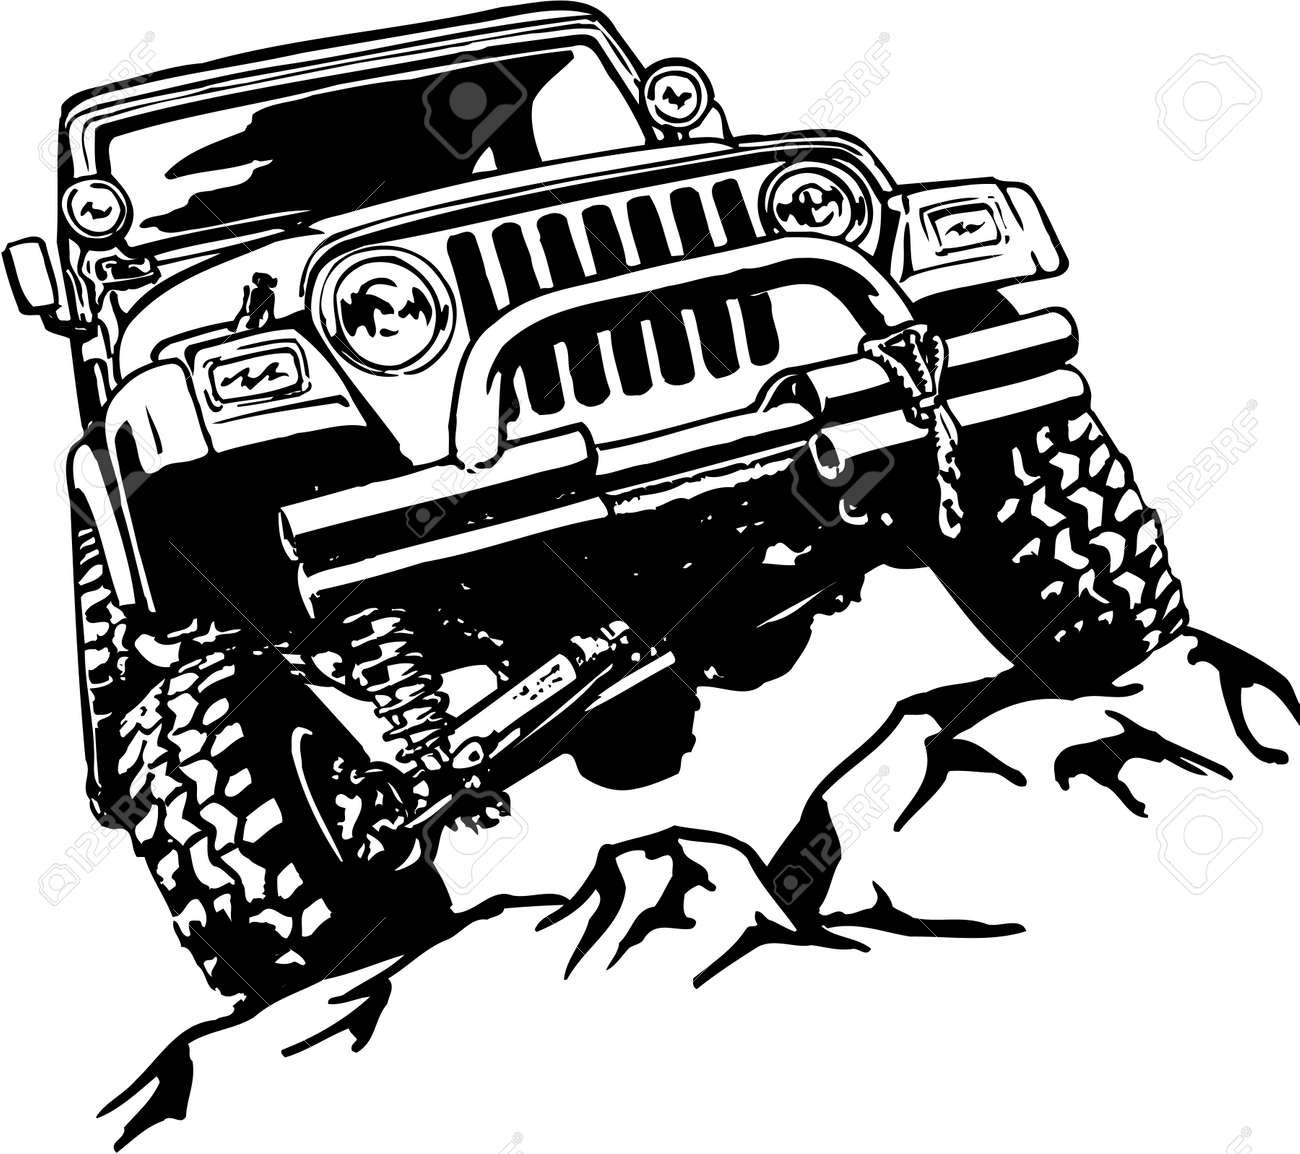 Truck Climbing Illustration - 87860863